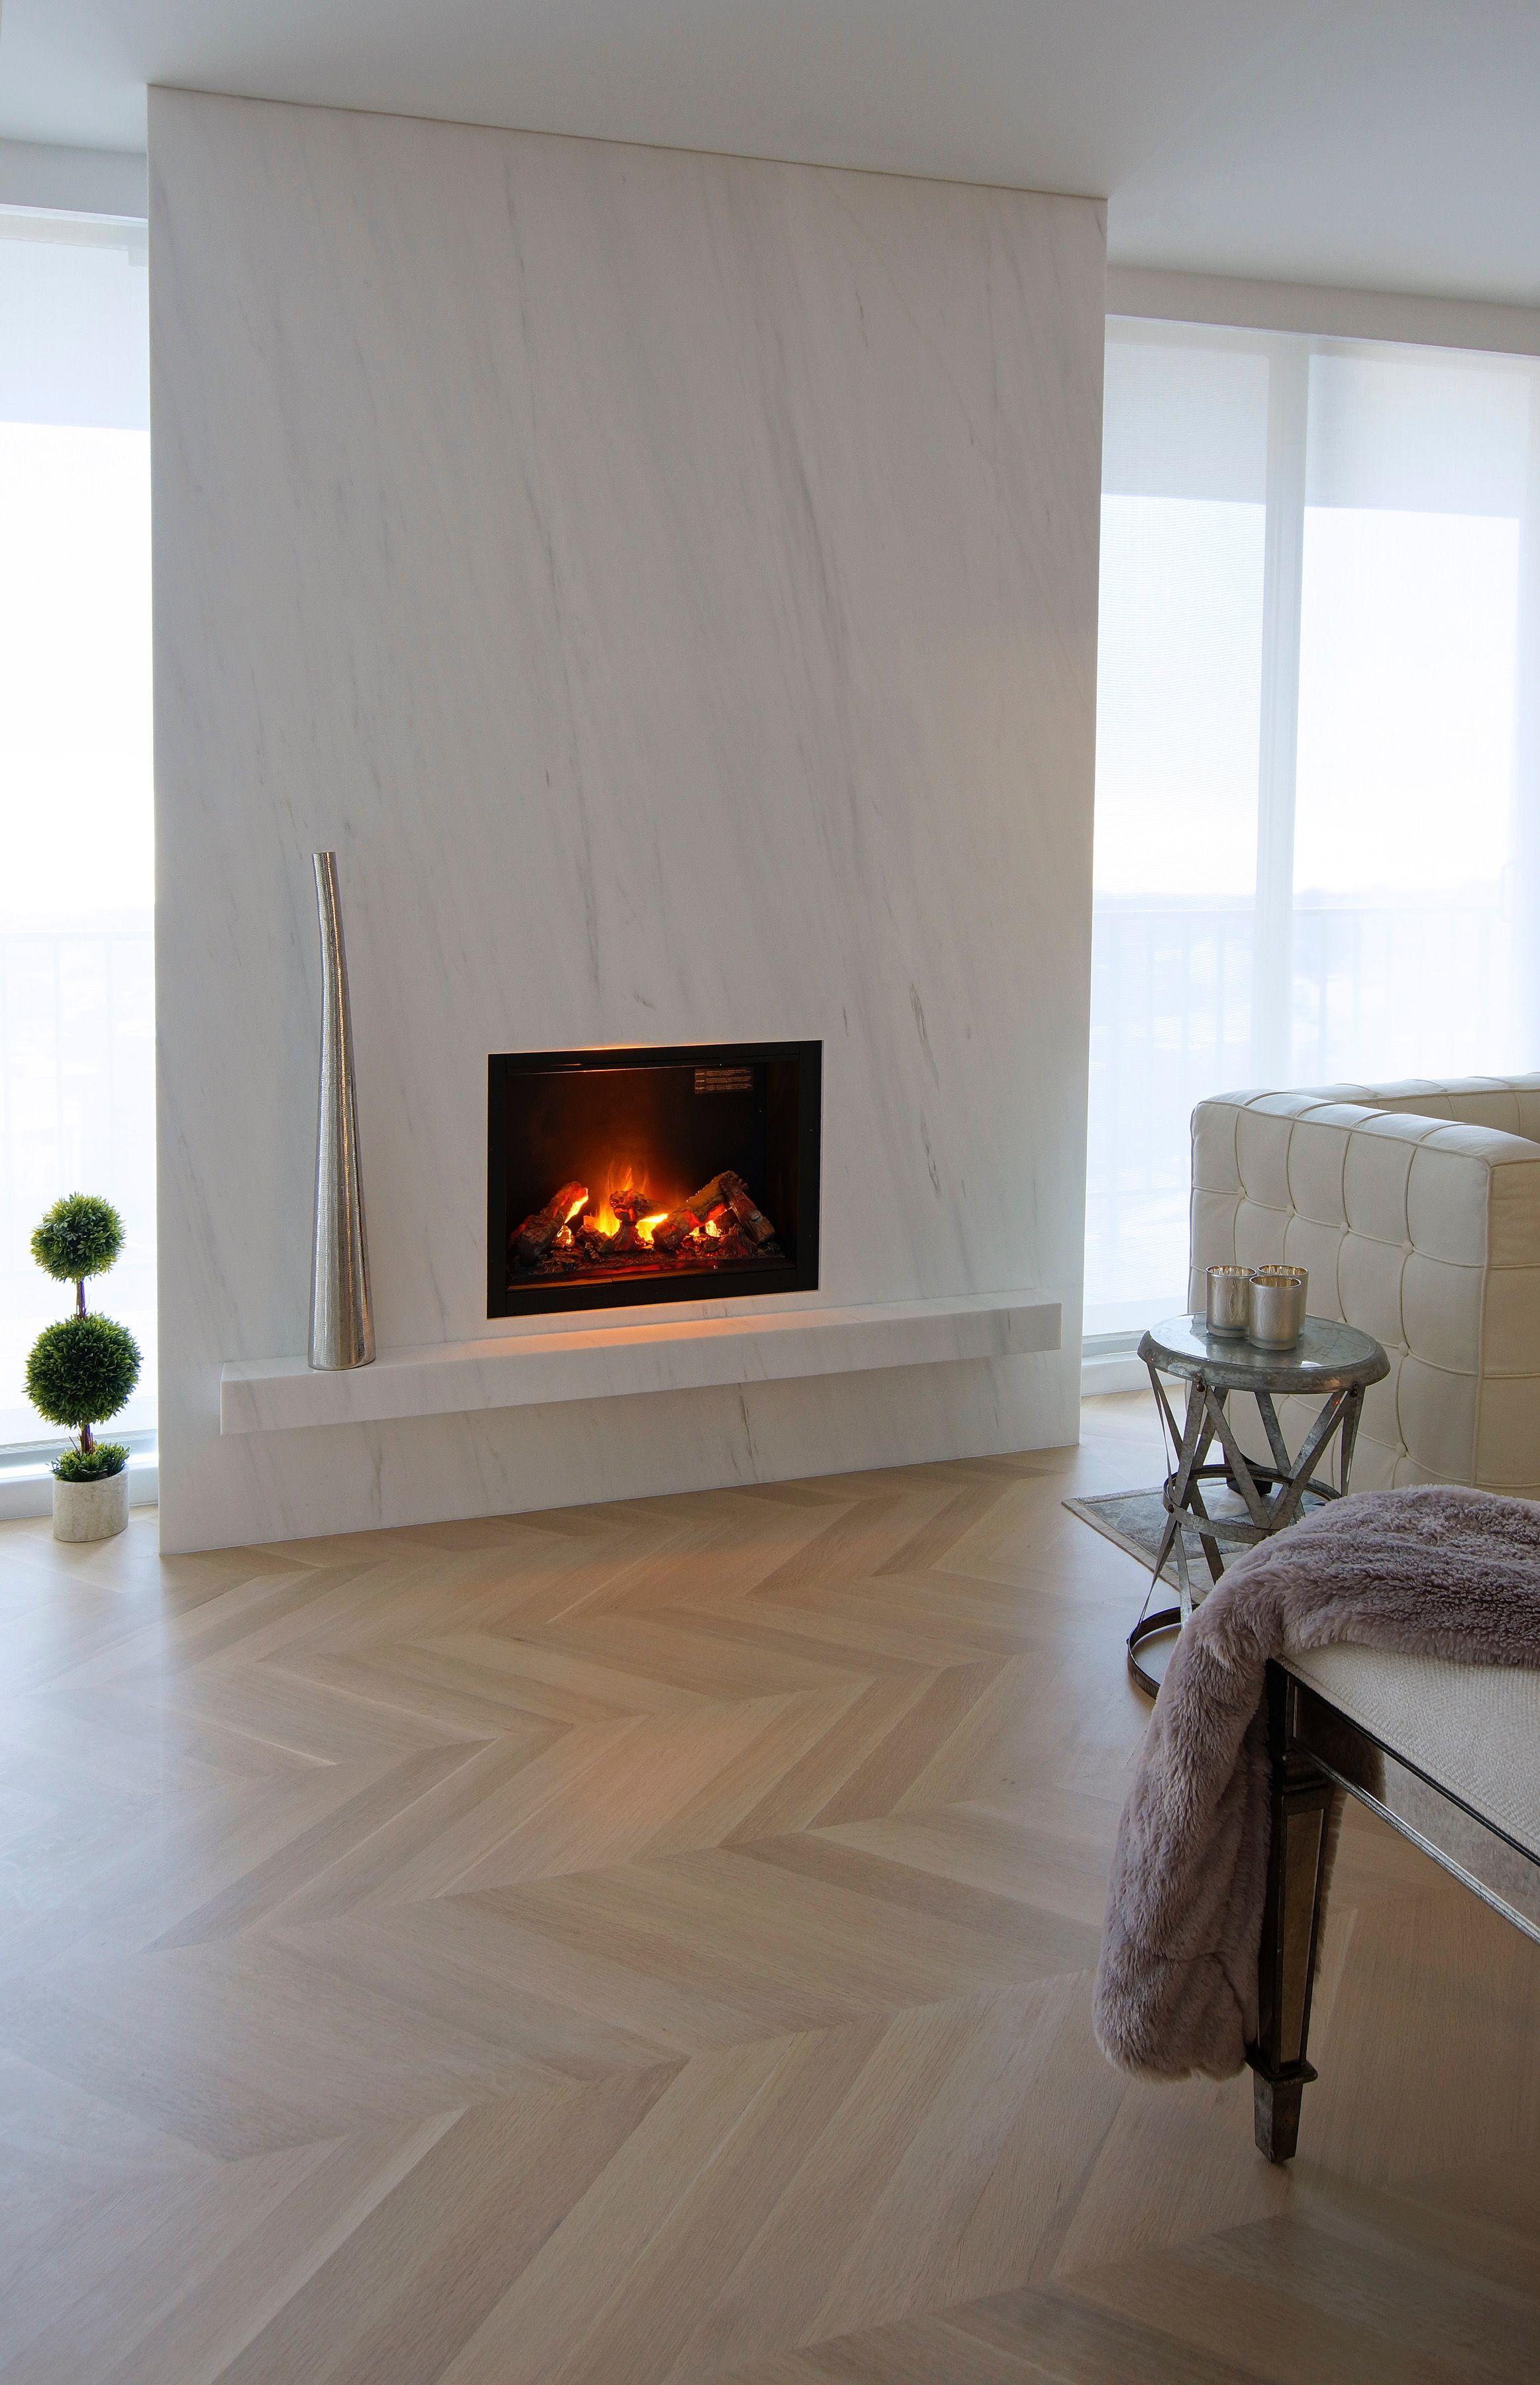 Shores Fireplace Beautiful Modern Fireplace Design Peg Vlachos